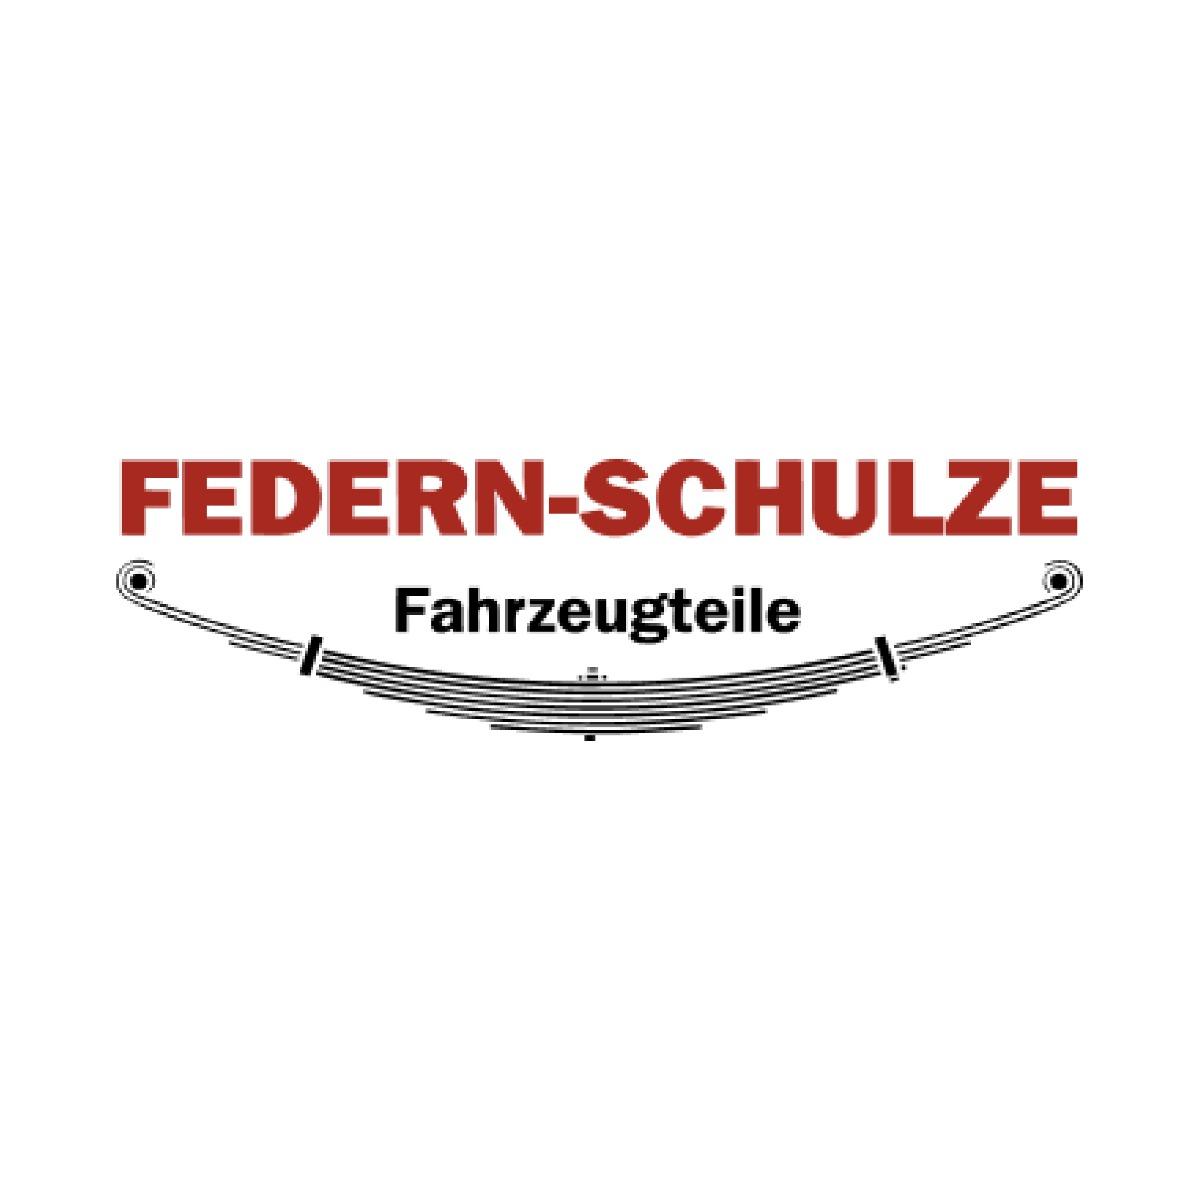 Federn-Schulze